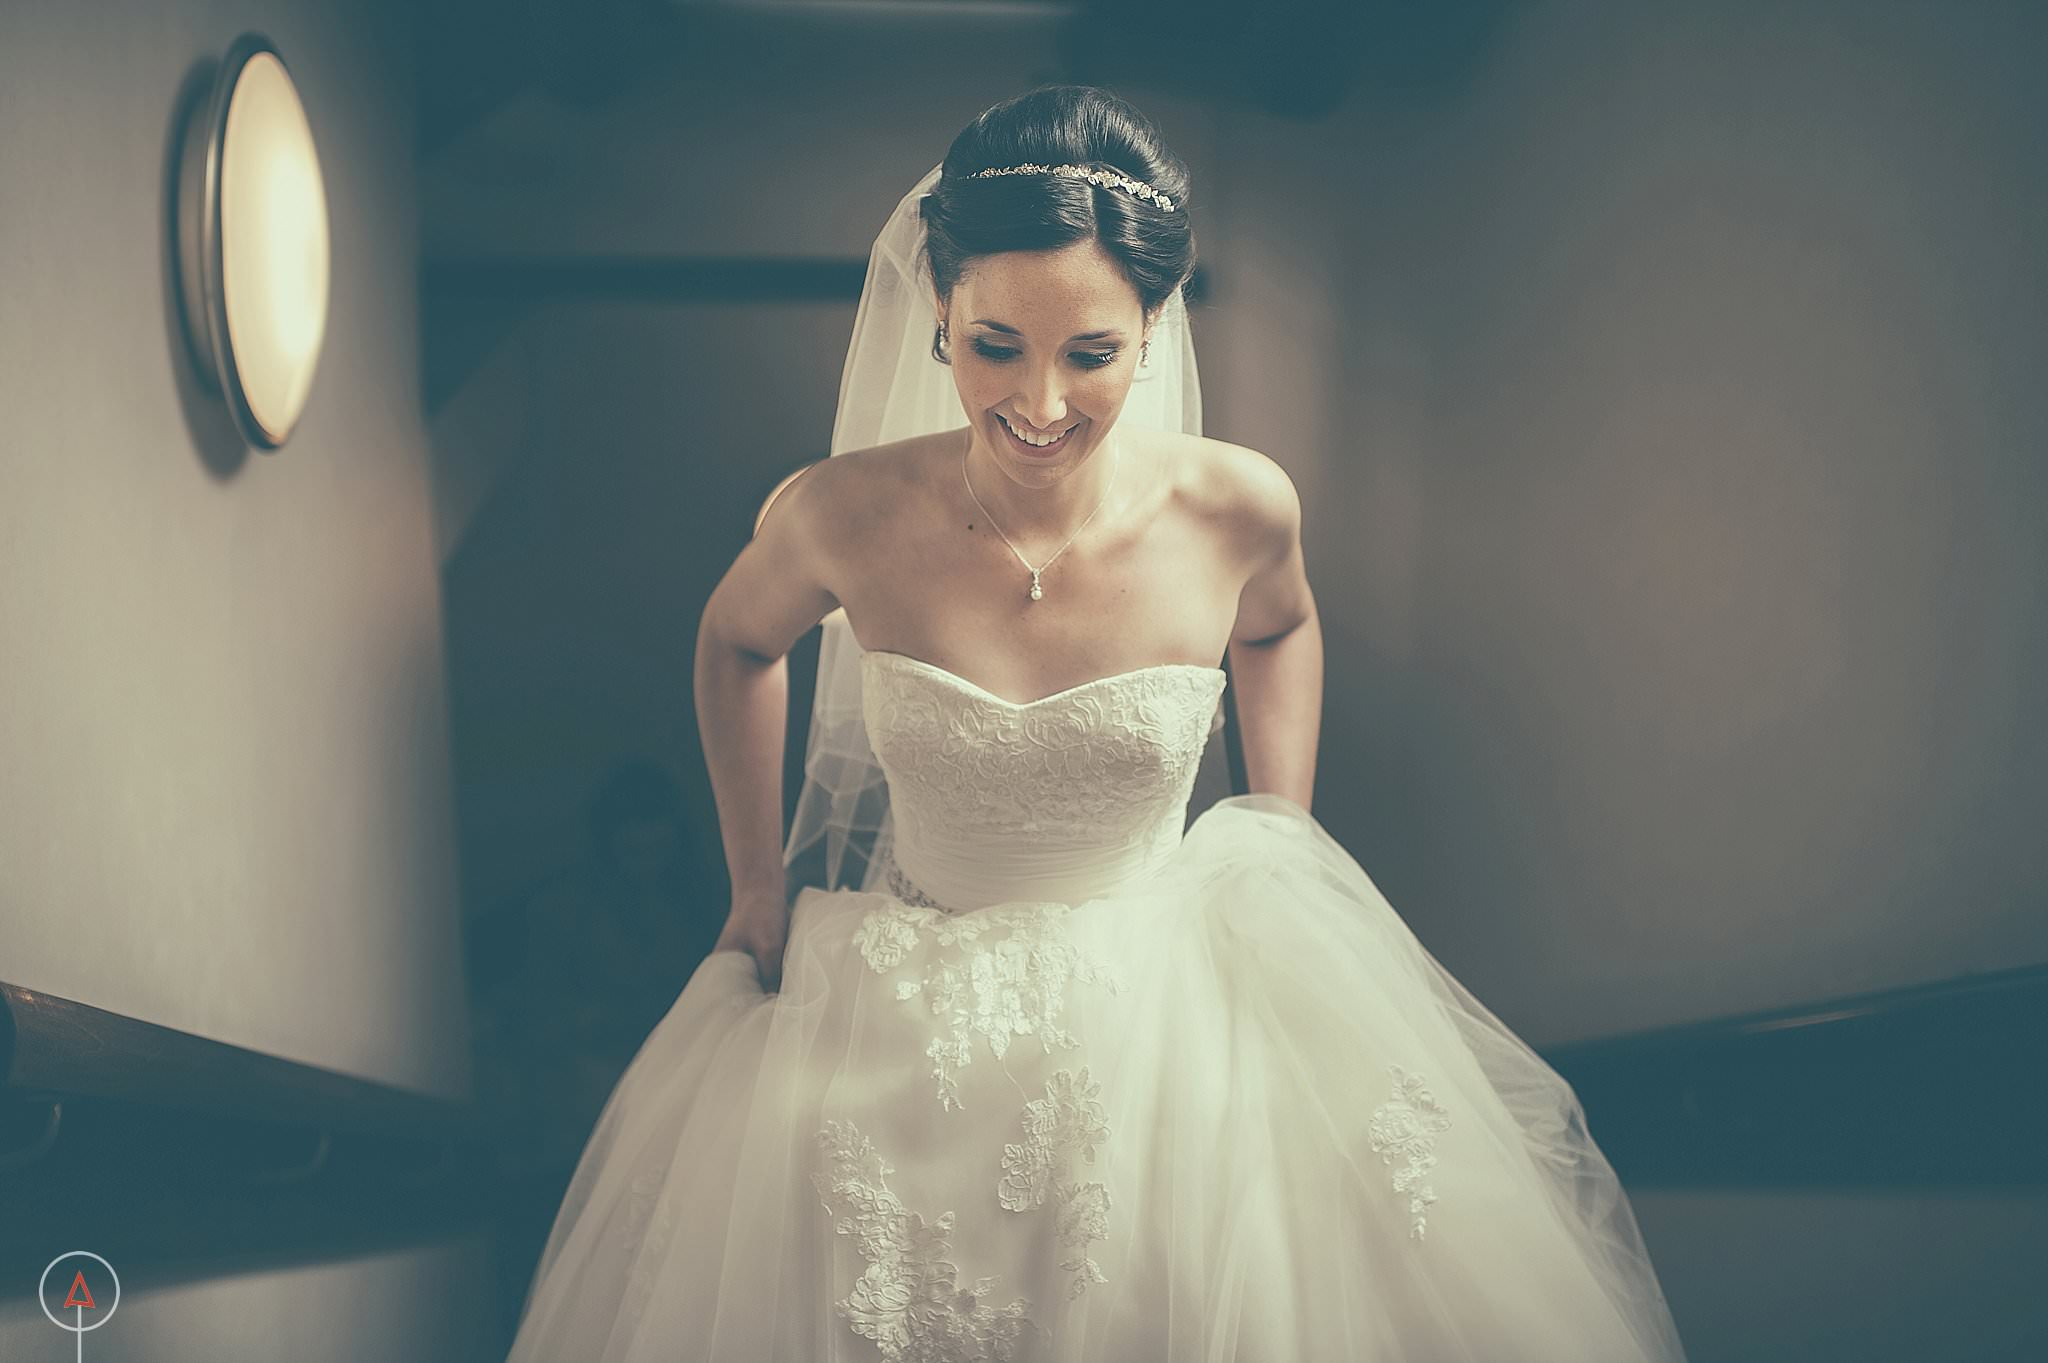 st-donats-llantwit-major-wedding-photography_0009